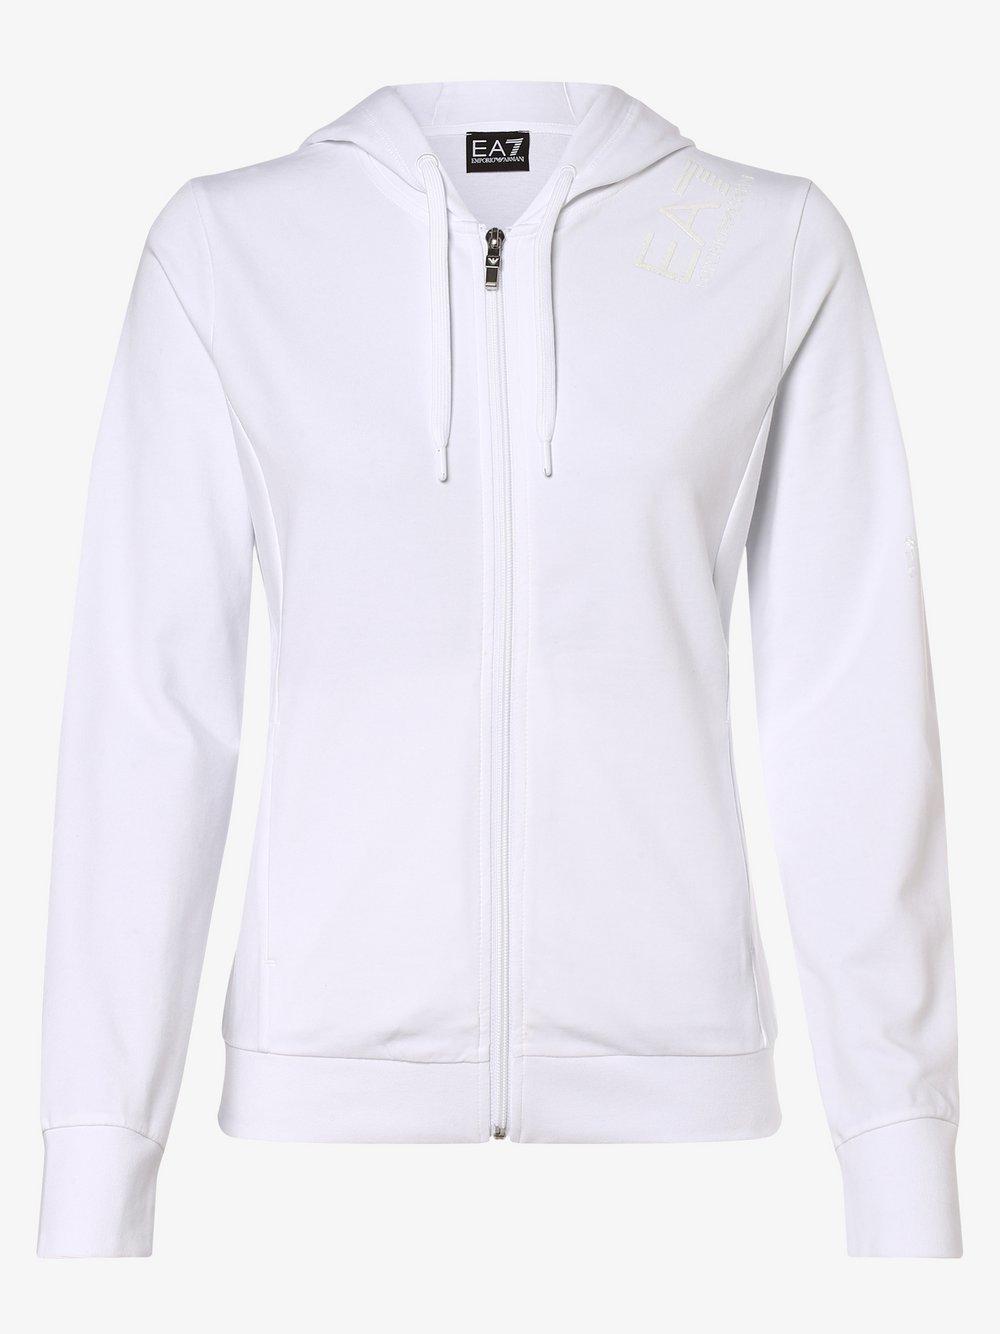 EA7 Emporio Armani - Damska bluza rozpinana, biały